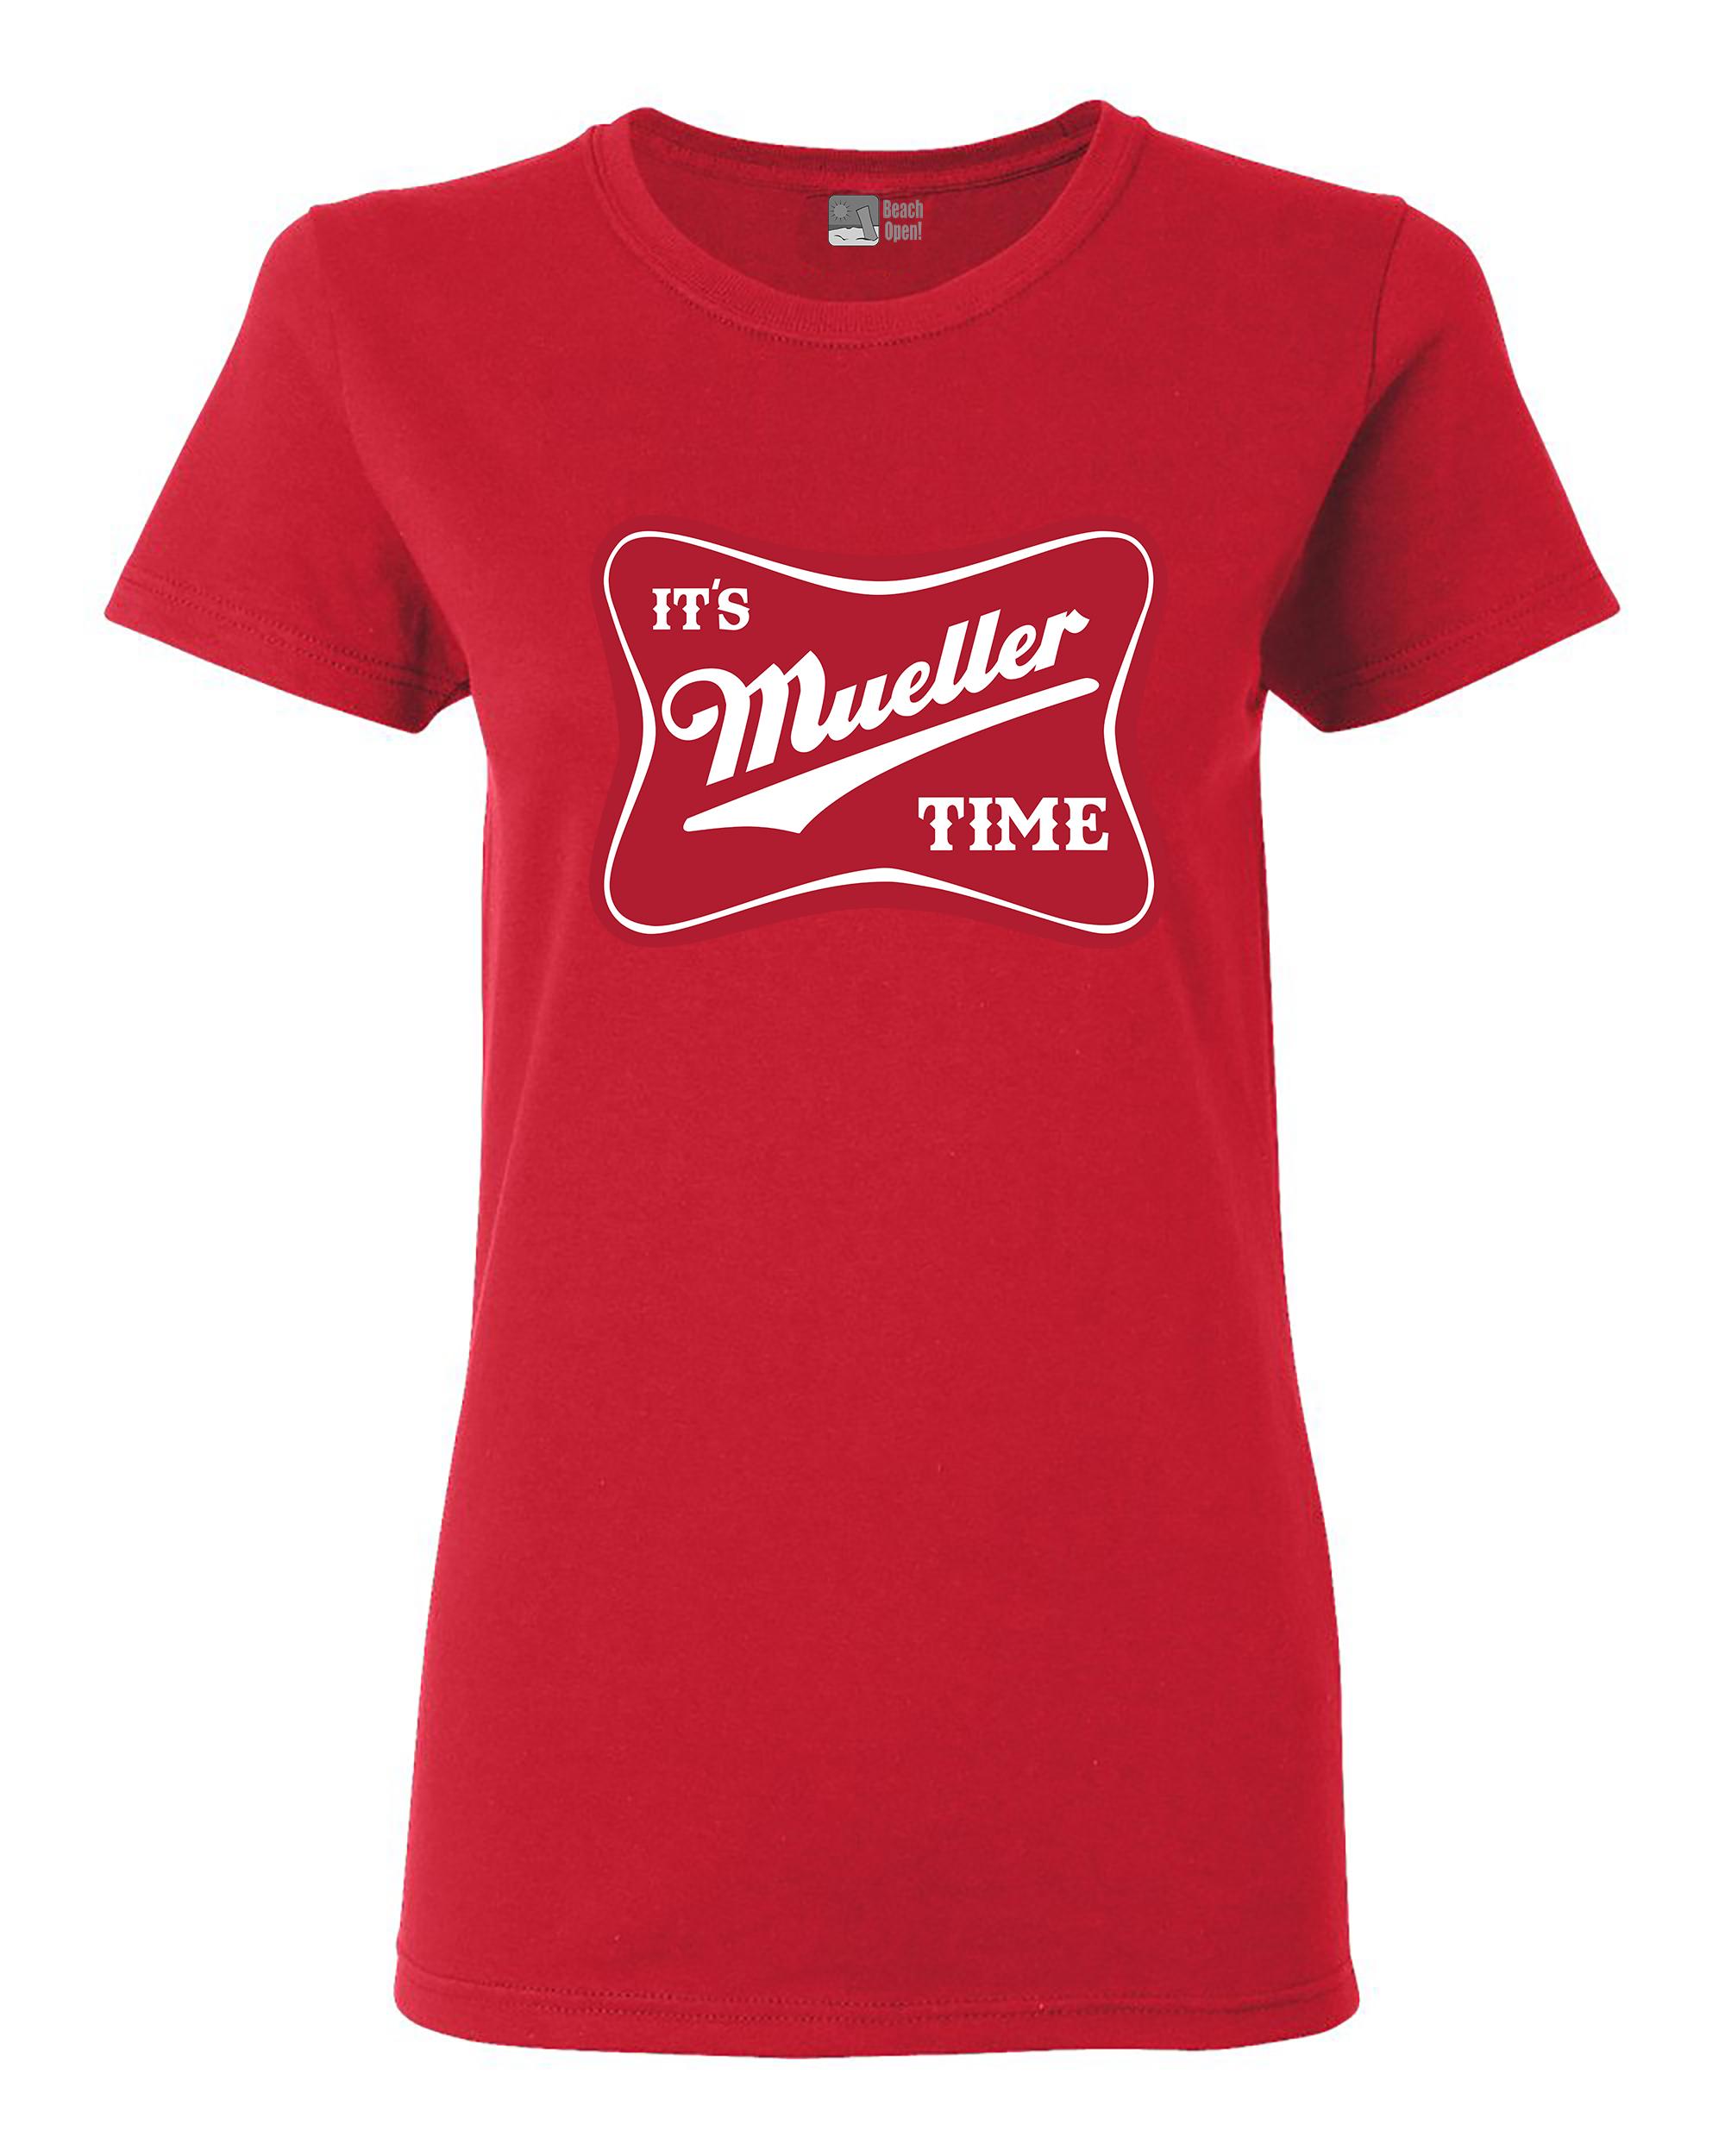 Ladies It's Robert Mueller Time USA Support Political DT T-Shirt Tee